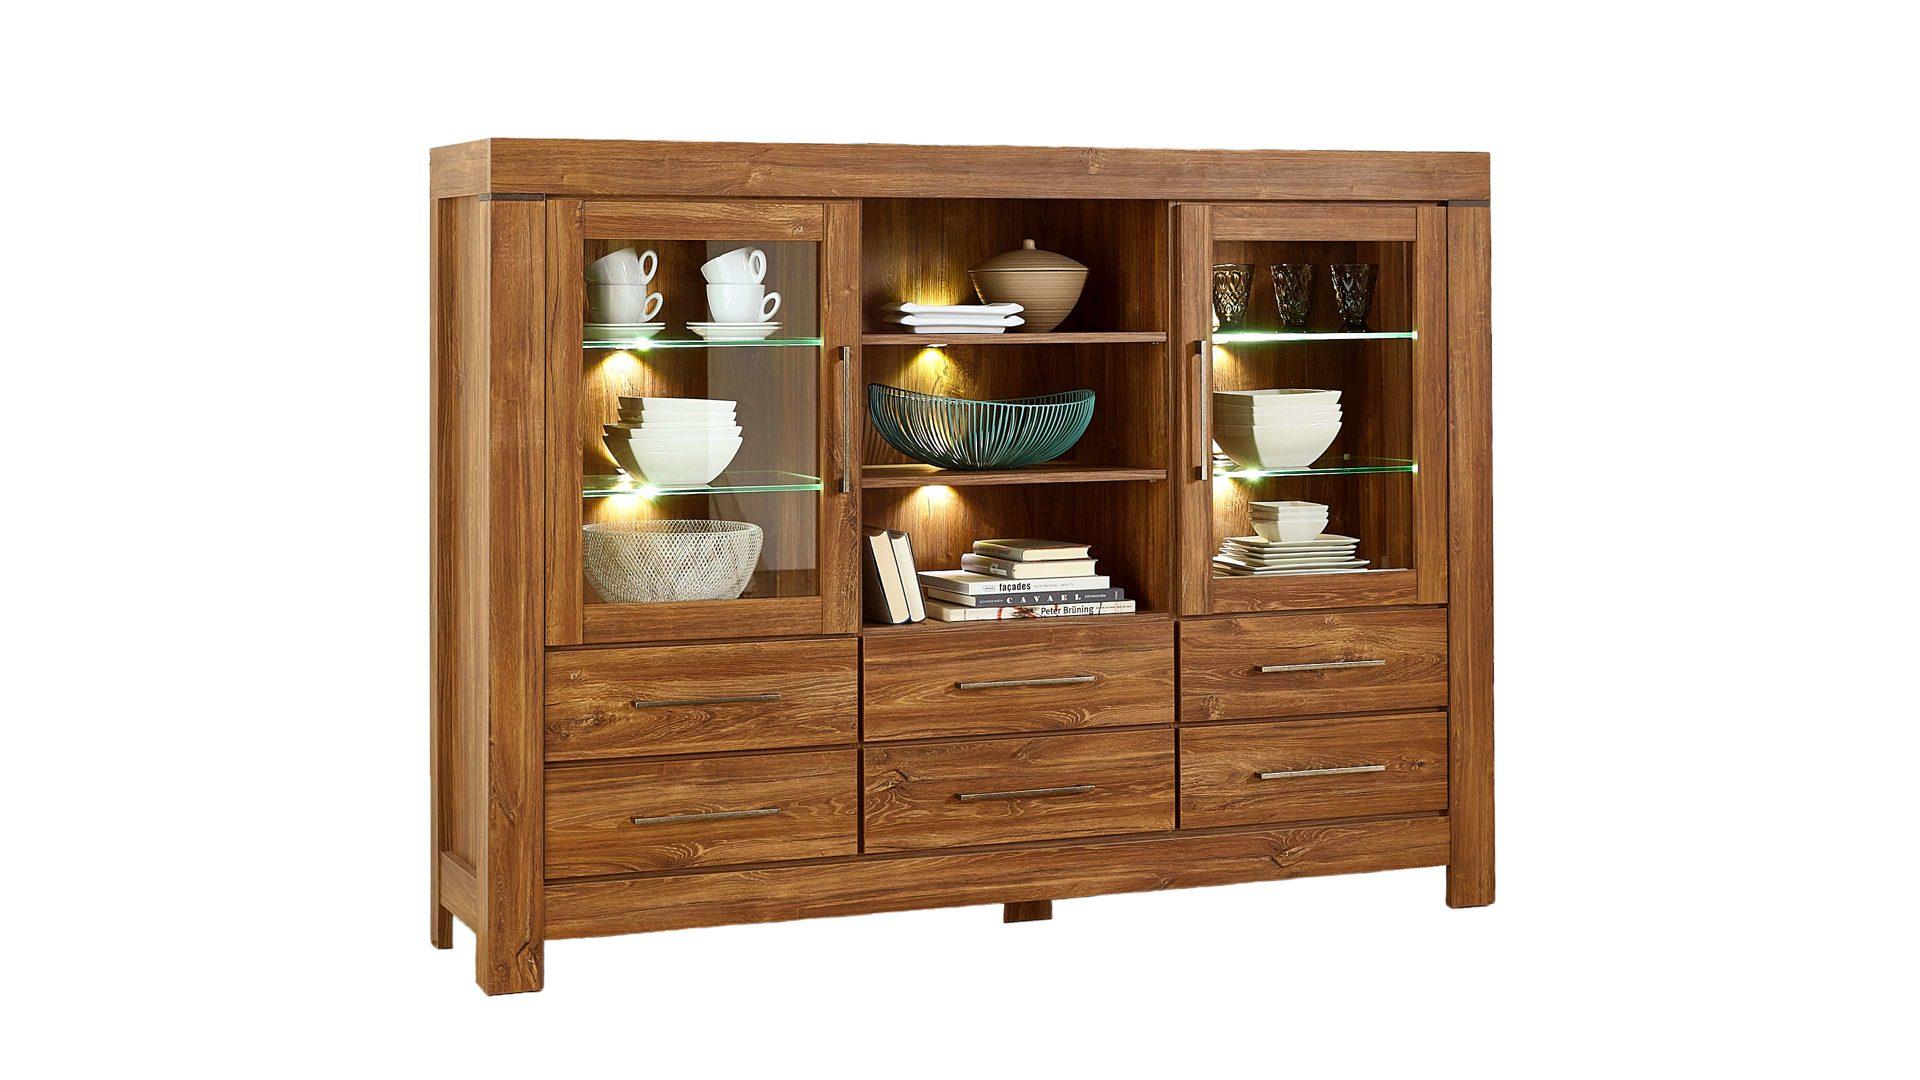 Möbel Hermes , Markenshops, Schlafzimmer, Highboard, Highboard bzw ...